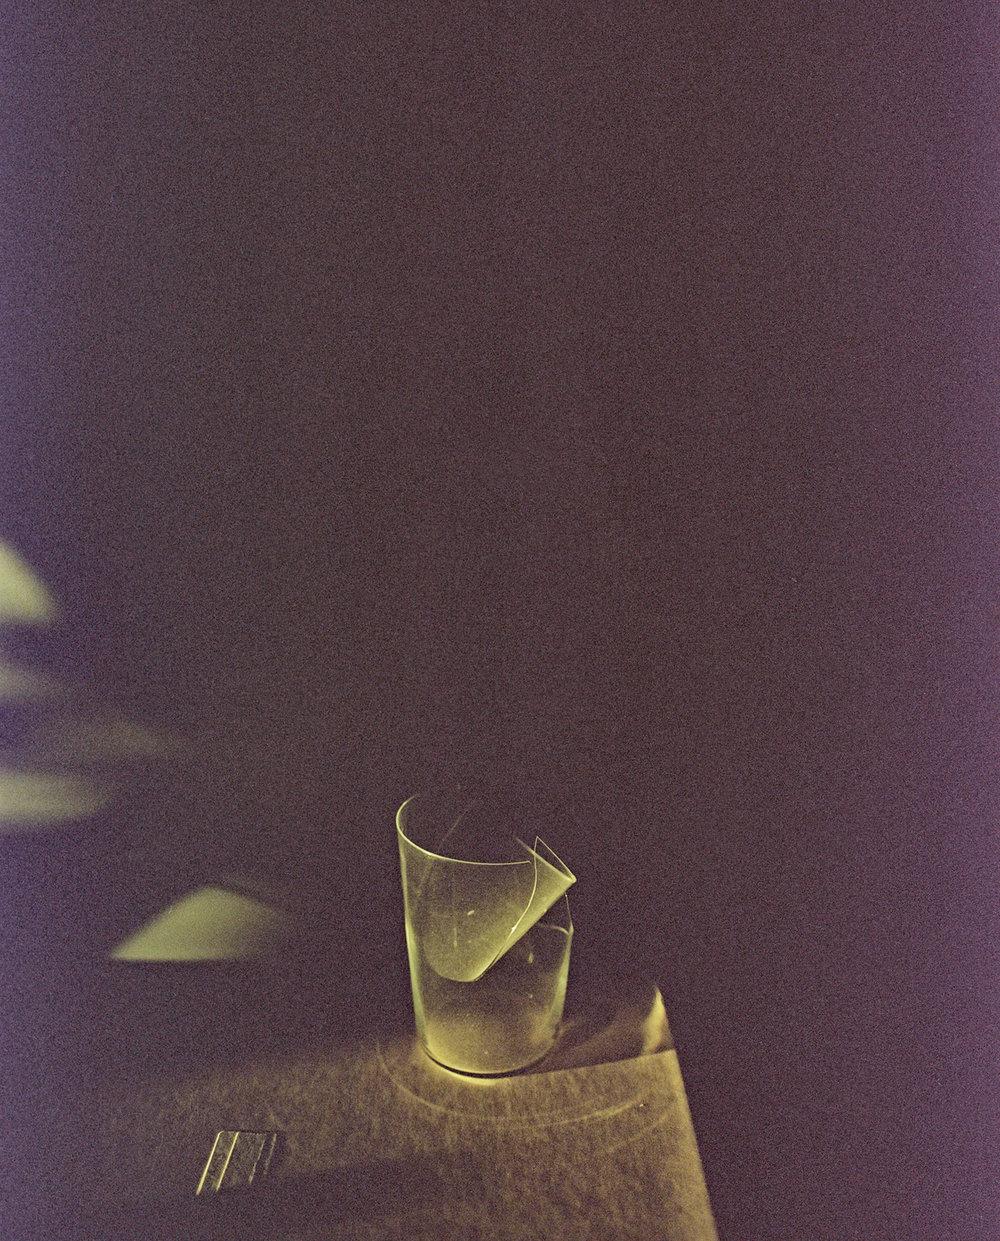 Broken Glass #48